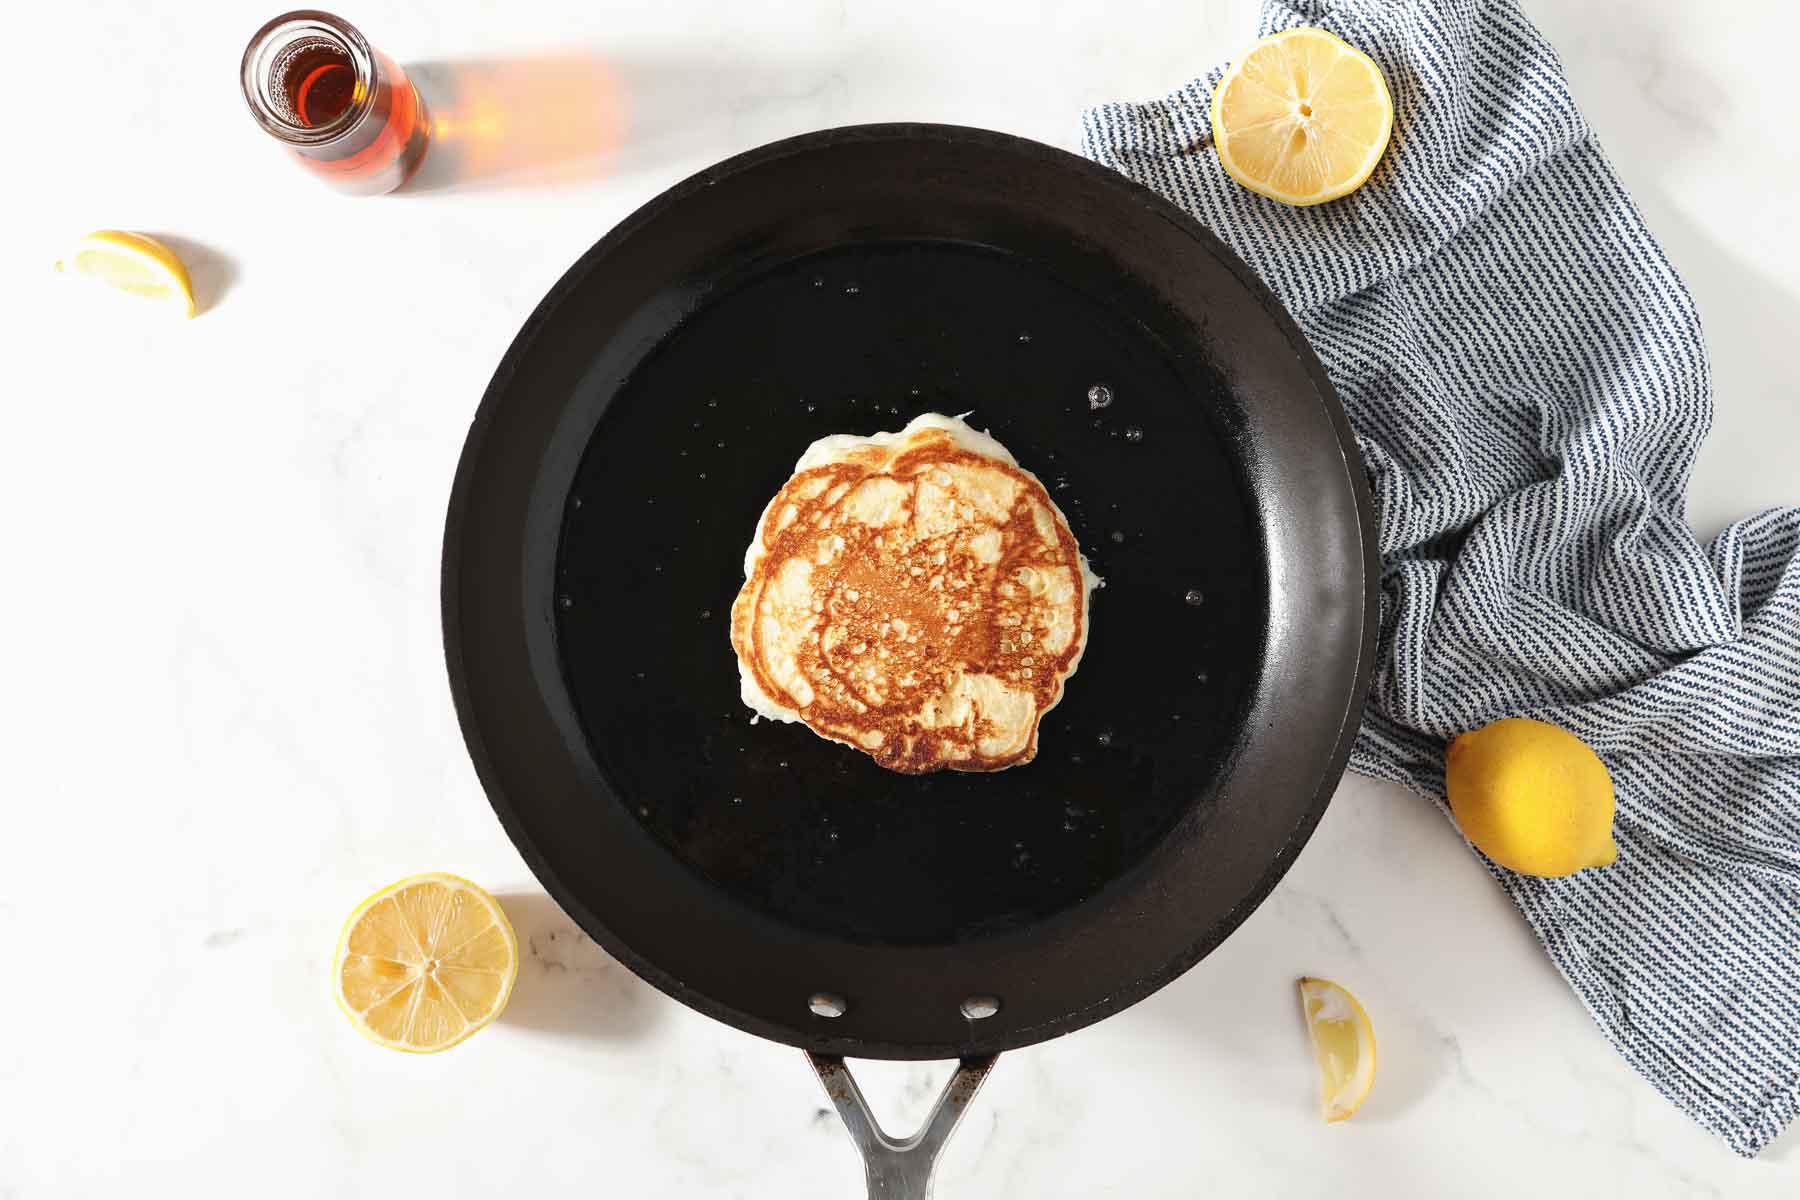 Golden brown pancakes in nonstick skillet.